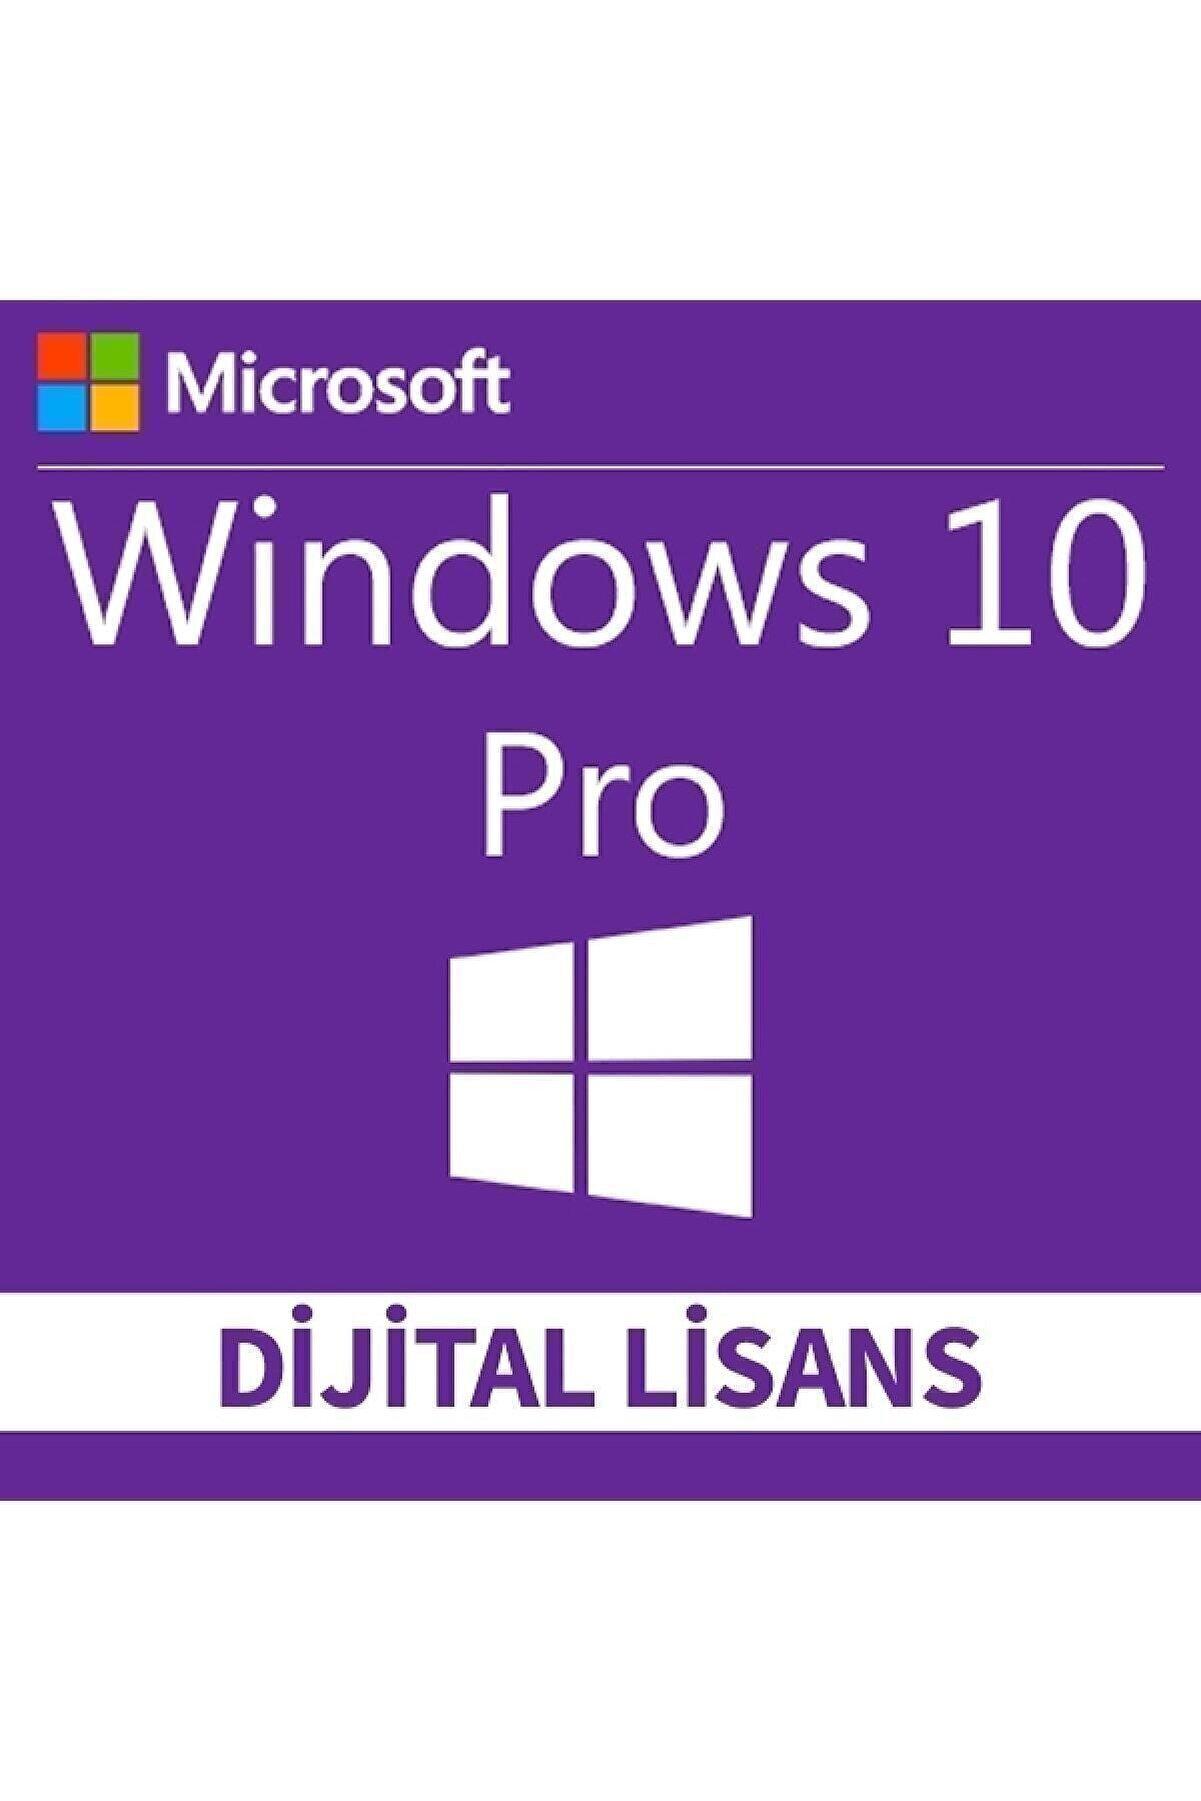 Microsoft Windows 10 Pro Orjinal Dijital Lisans Anahtarı